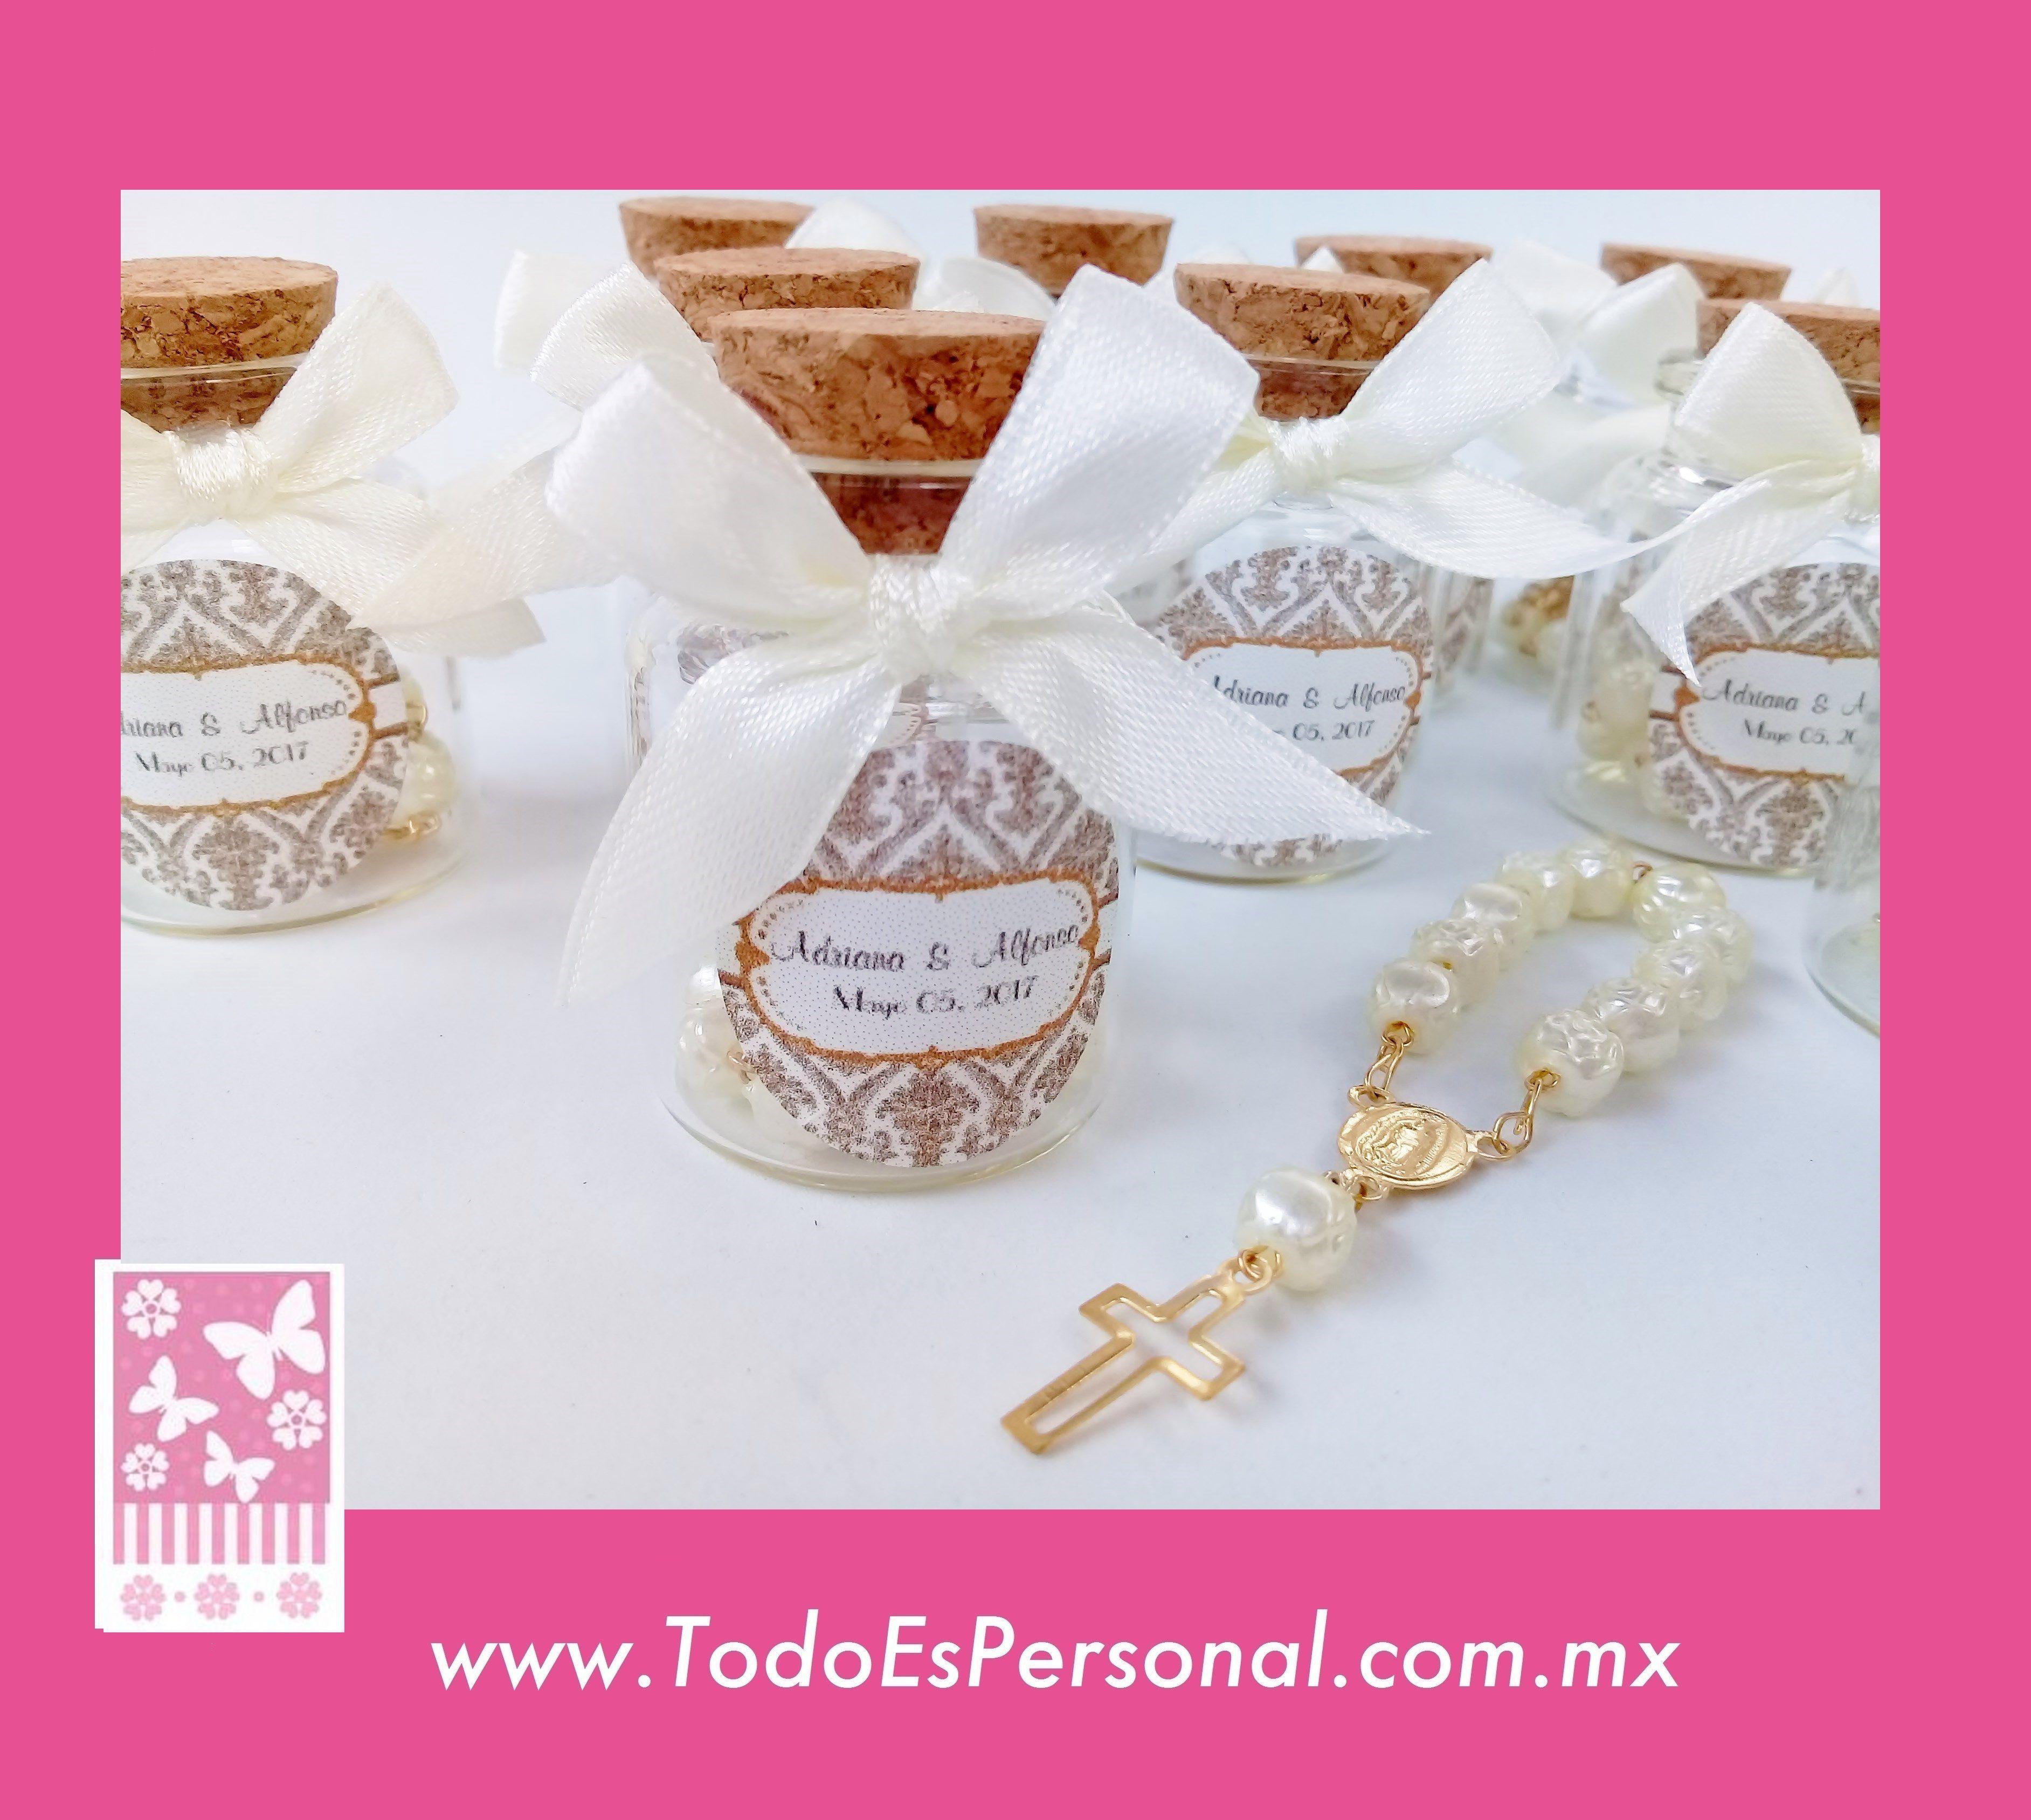 Matrimonio Catolico Padrinos : Decenario frasquito frasco corcho iglesia boda misa